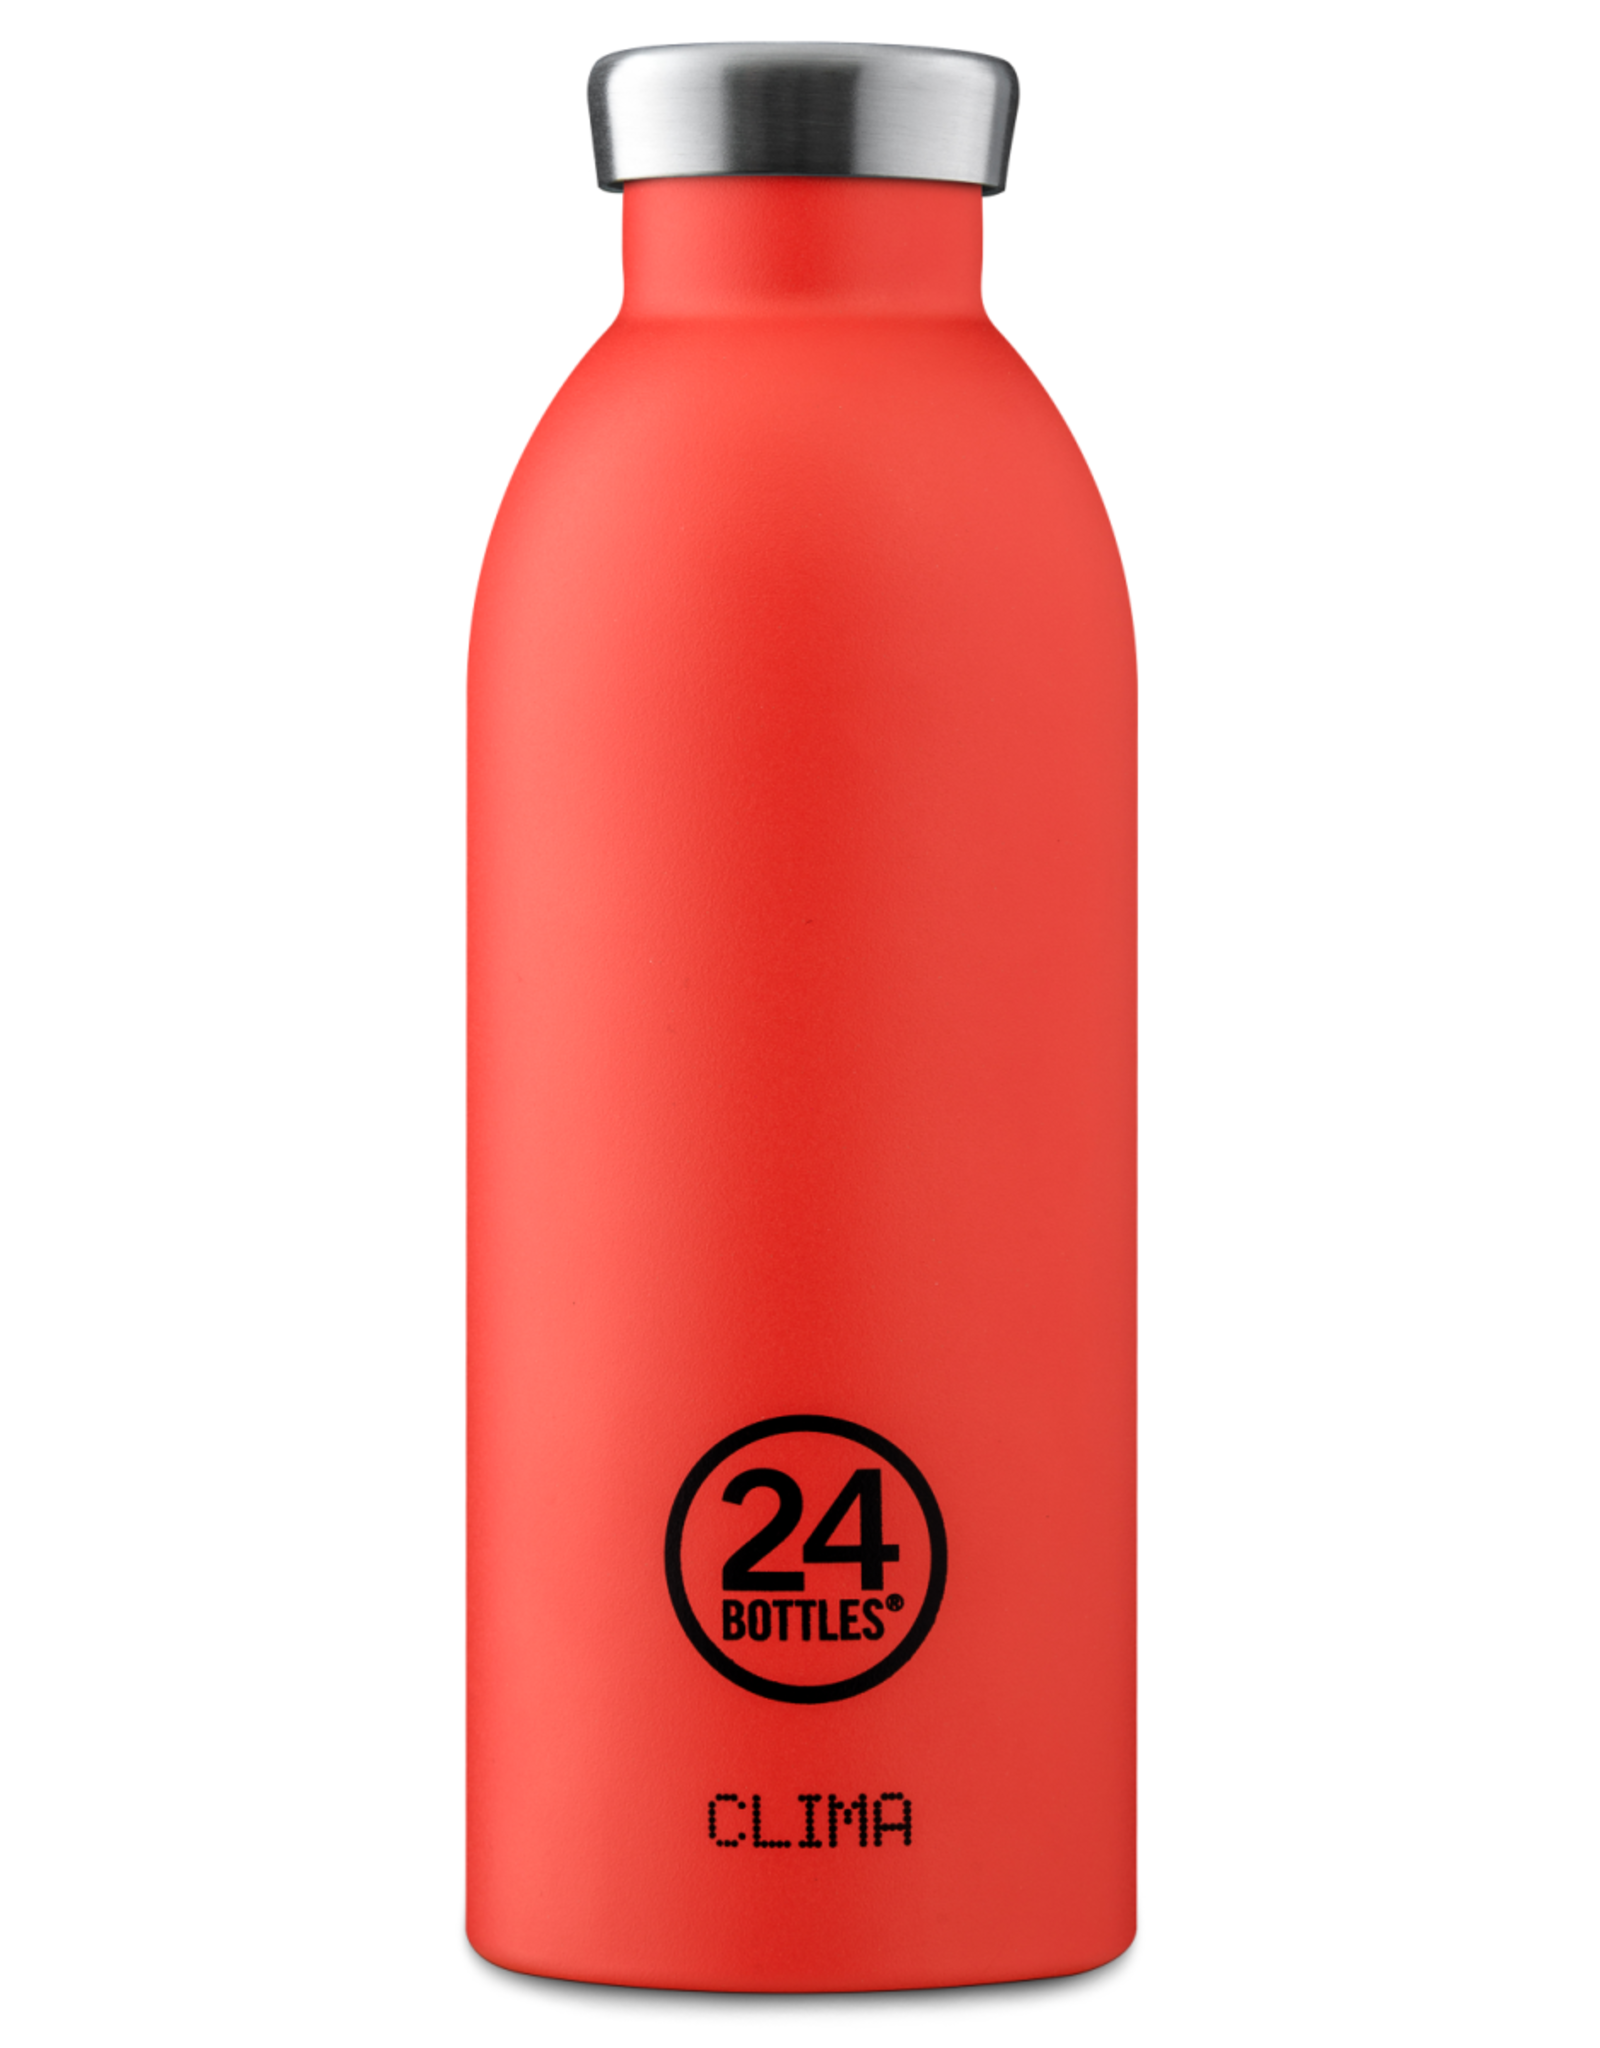 24 bottles Clima bottle - Pachino 500 ml